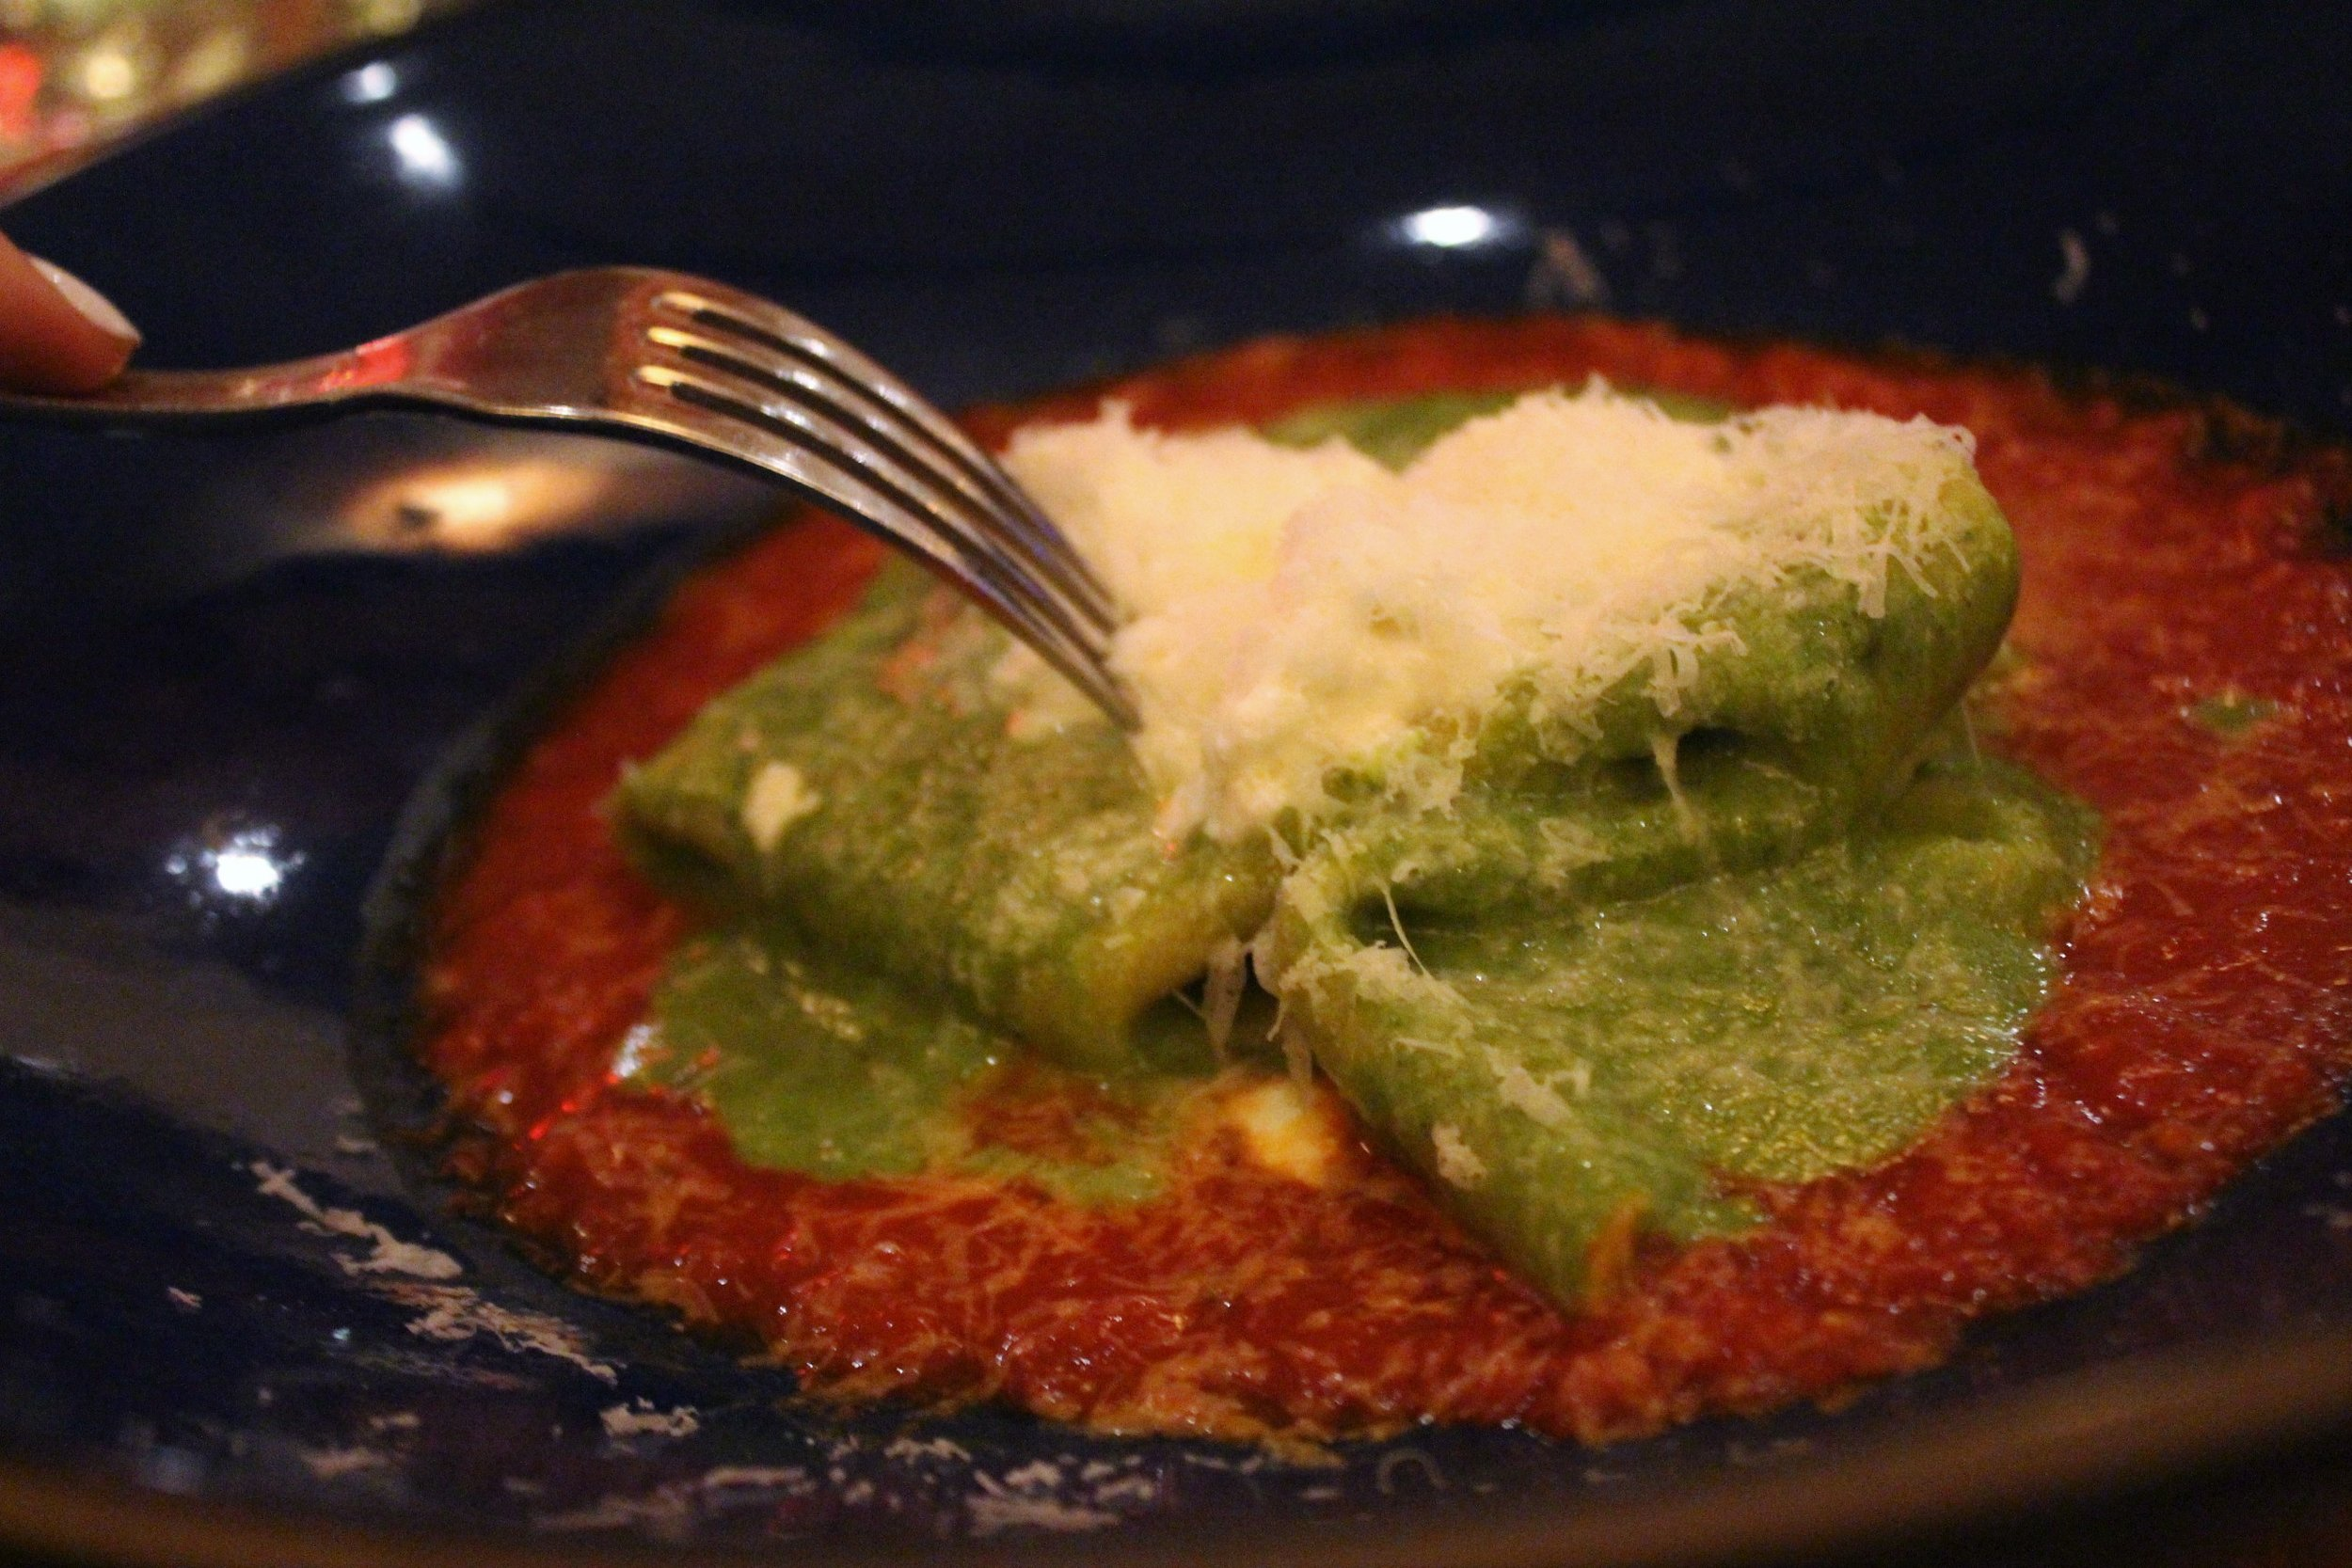 Mandilli: Folded Pasta Sheet, Basil Almond Pesto, Housemade Ricotta, San Marzano Sugo at Covina